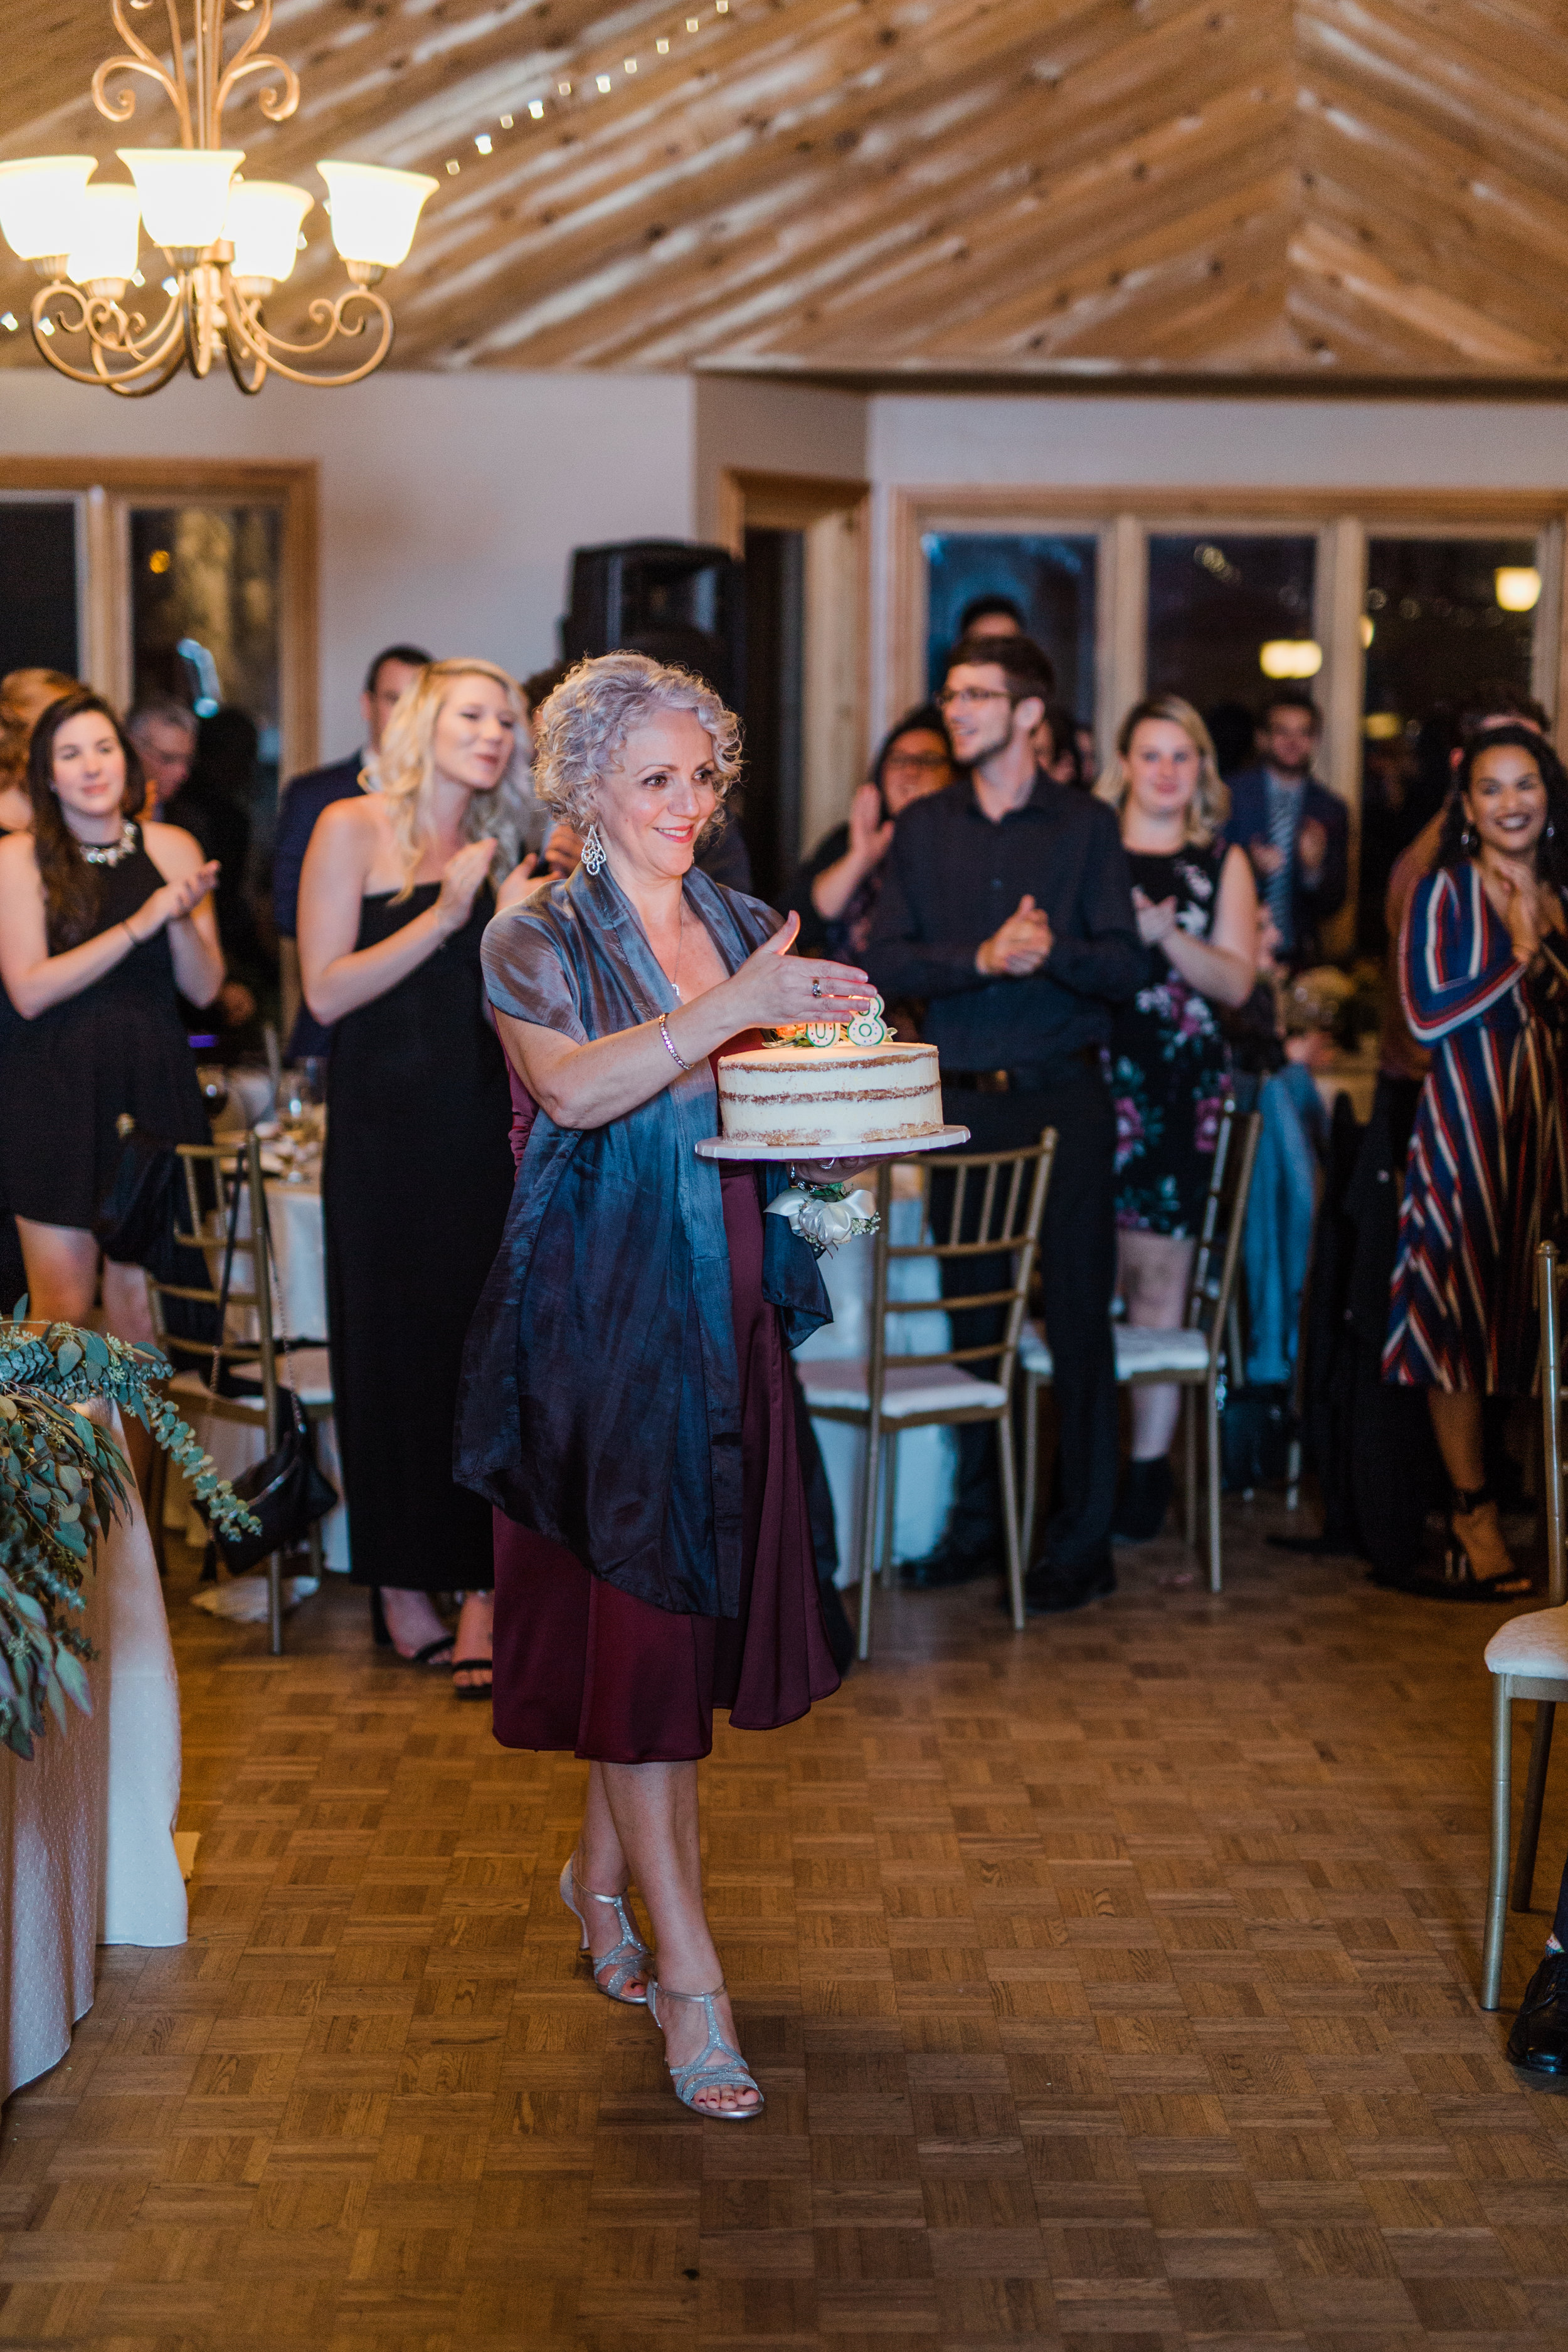 Amir-Golbazi-Danielle-Giroux-Photography_Toronto-Wedding_Cedarwood_Rachel-Paul_721.jpg